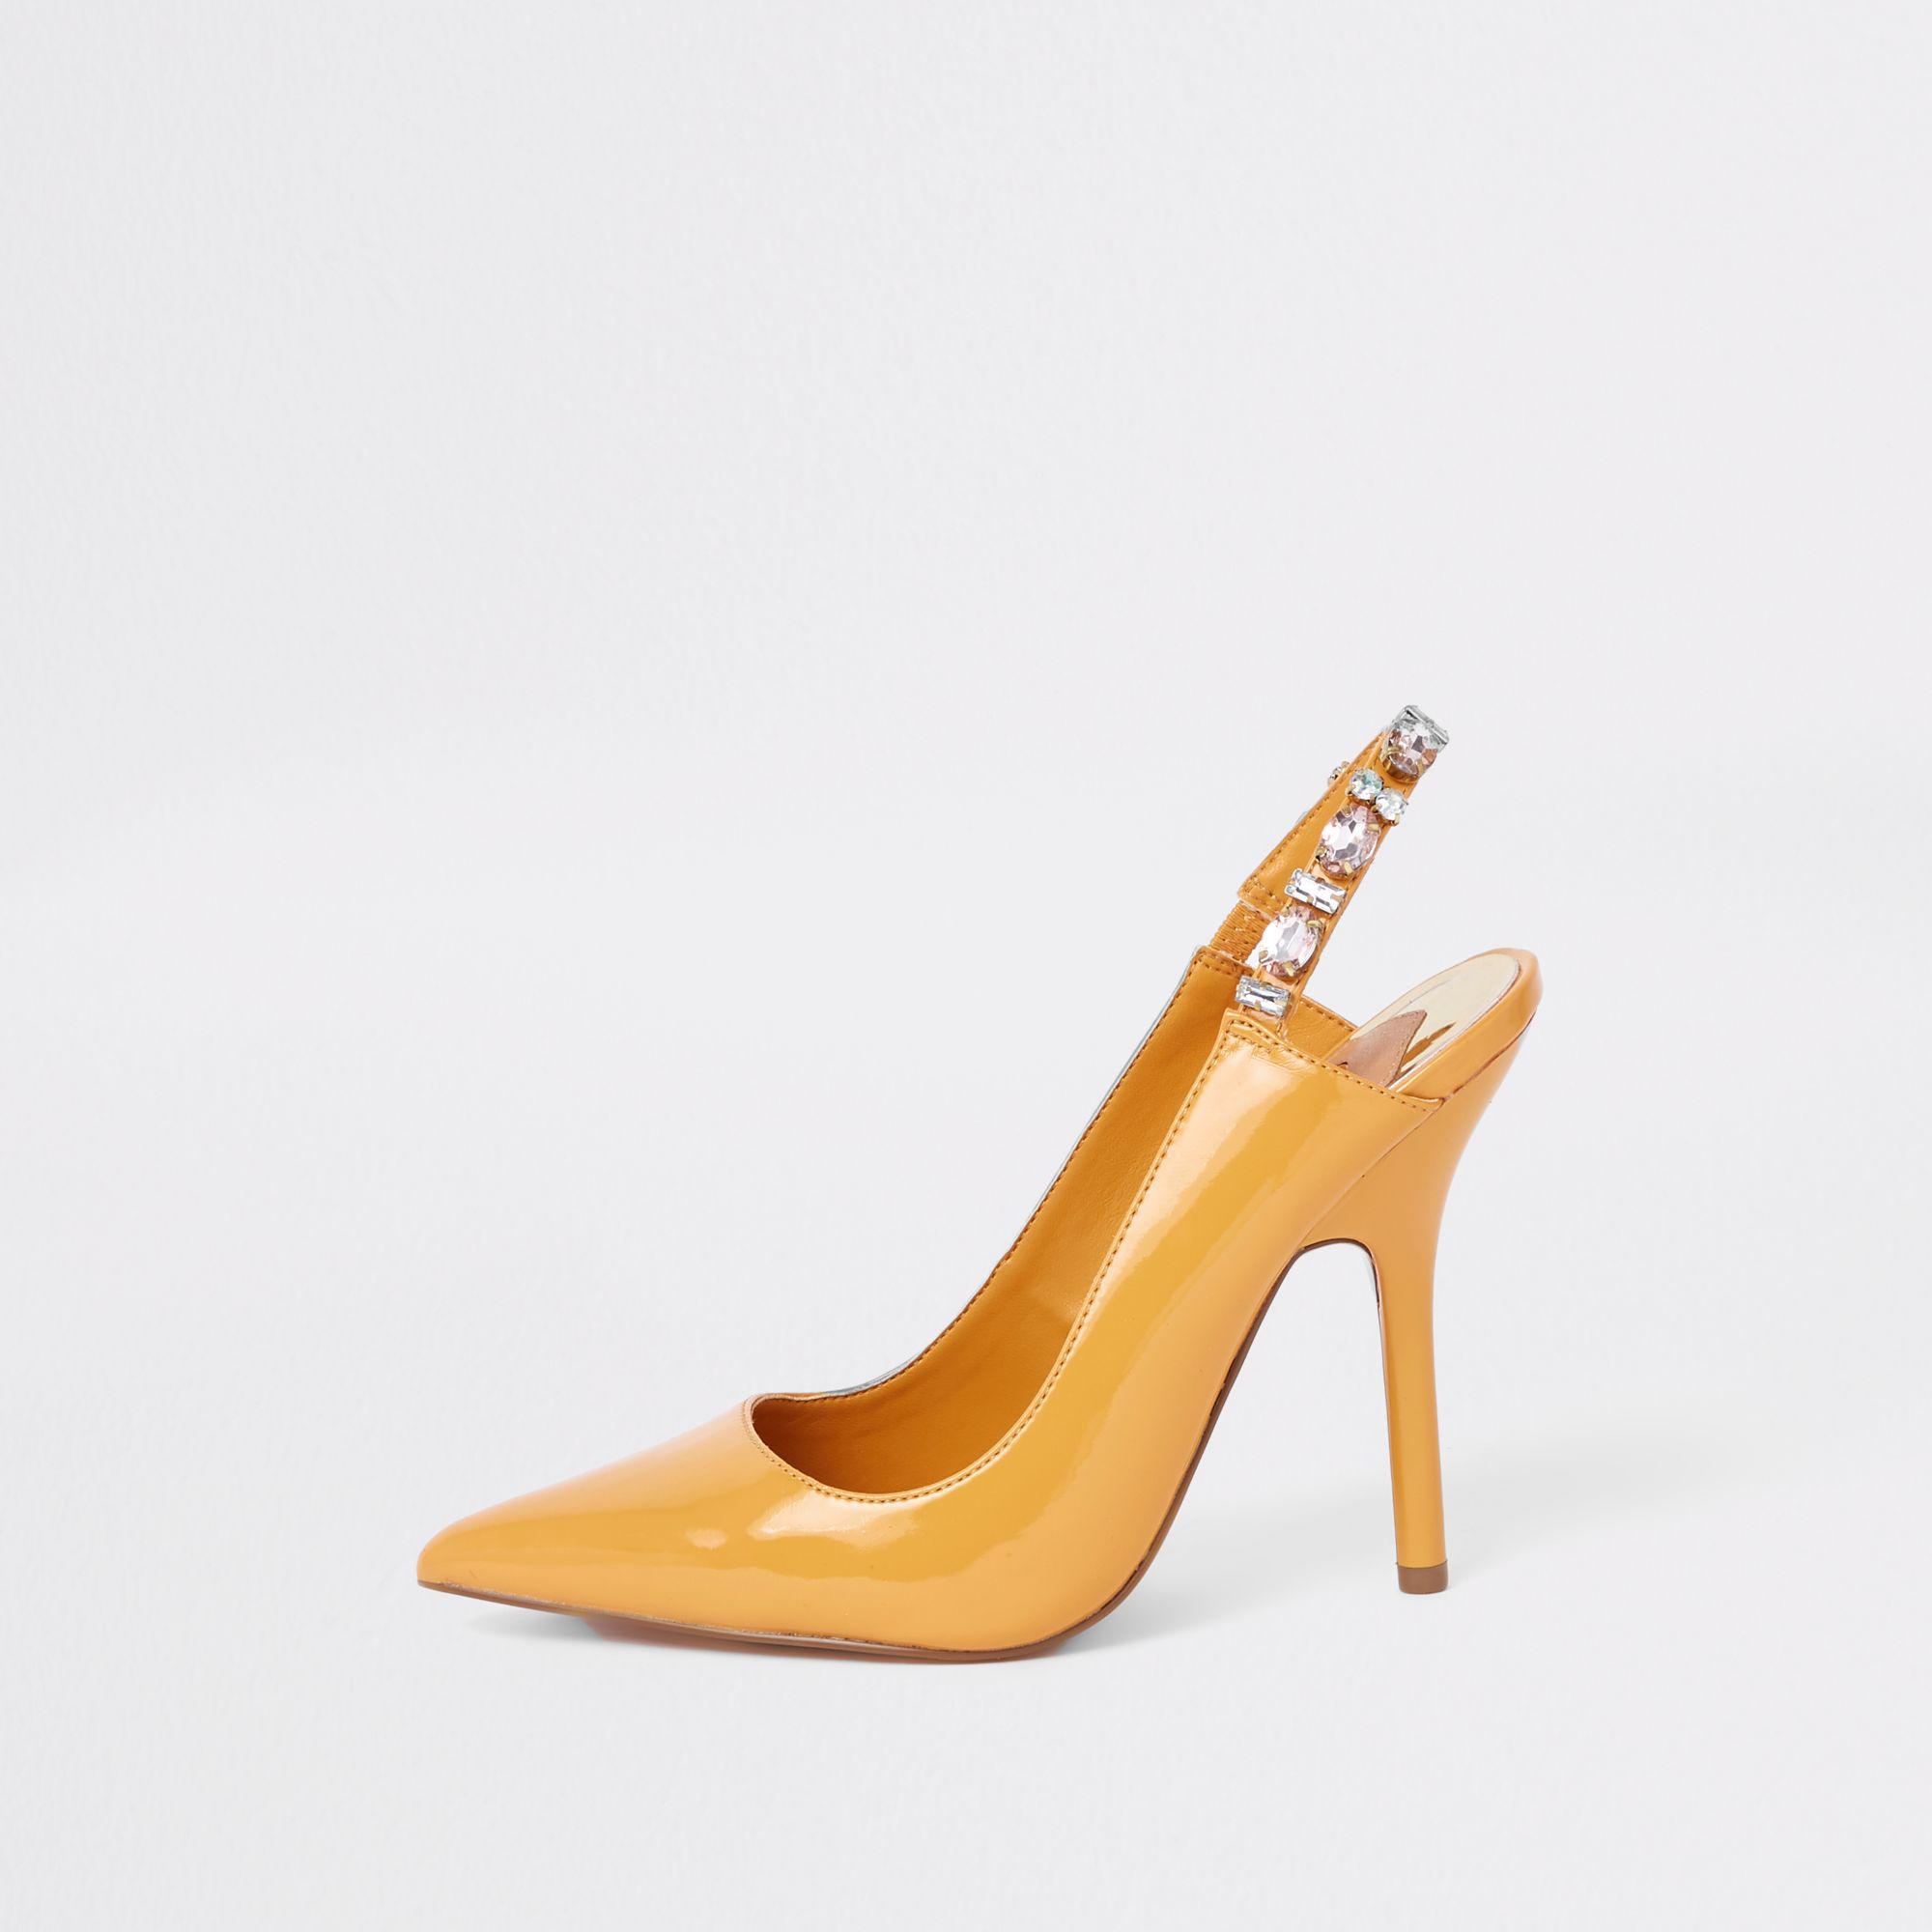 b5e3b1e0694 River Island Yellow Jewel Embellished Court Shoes